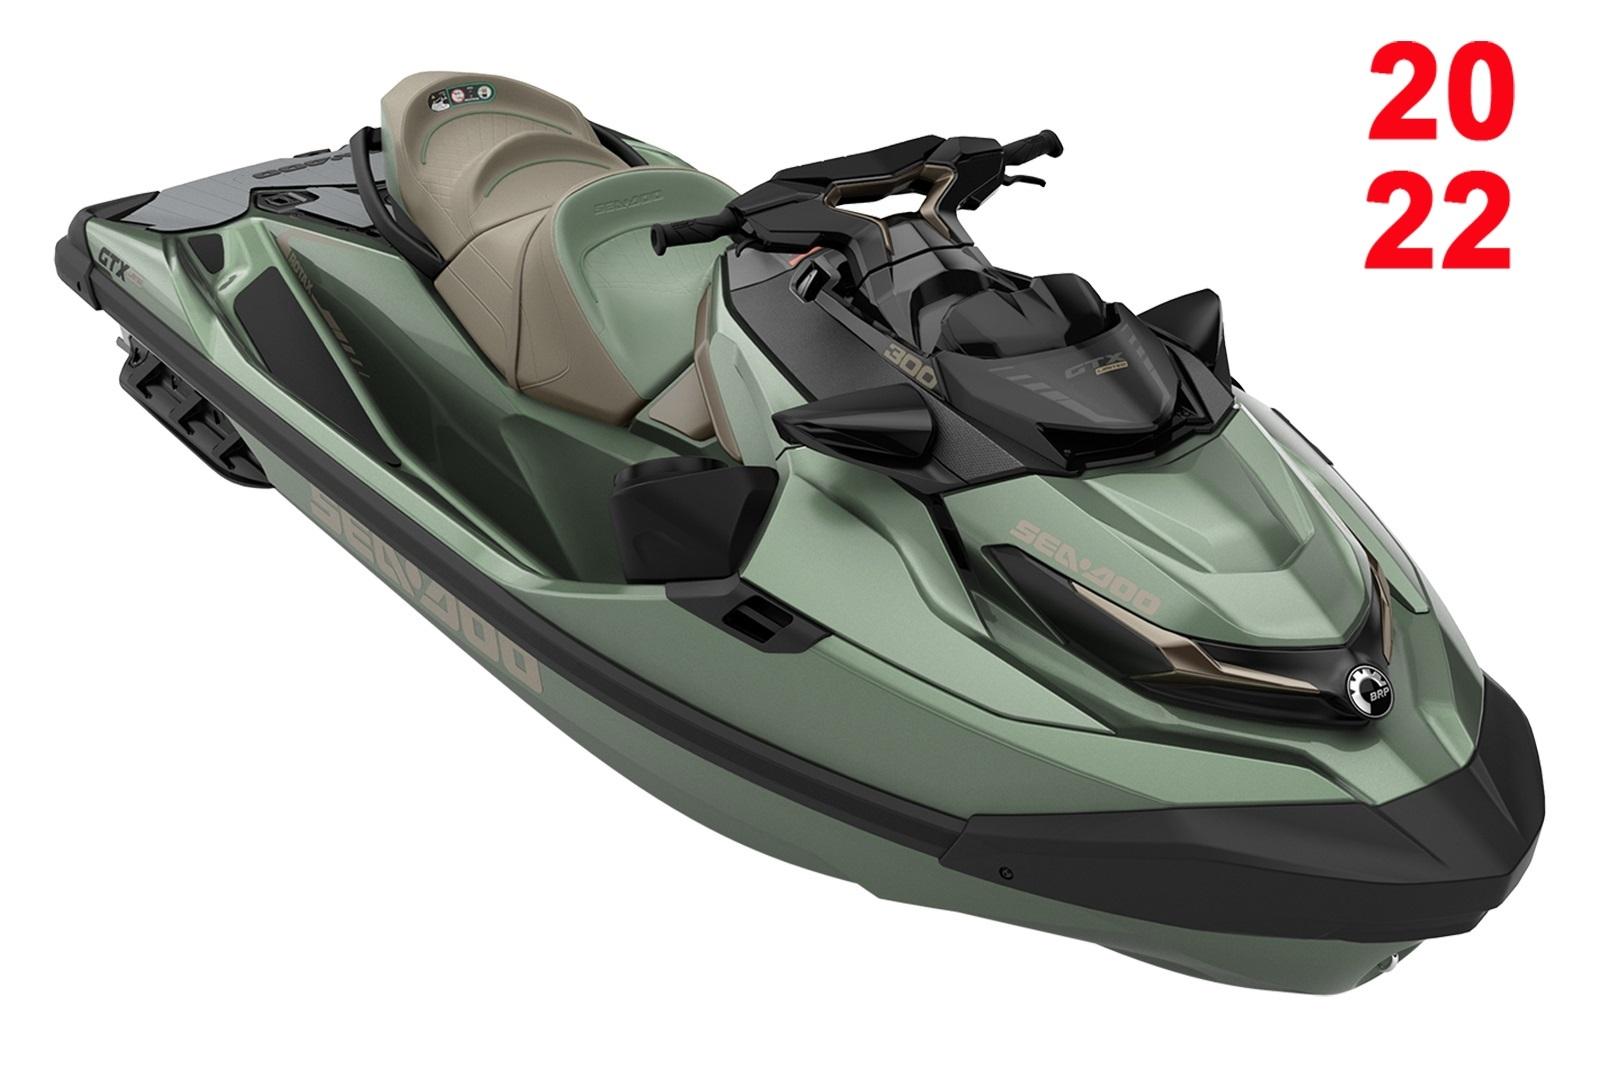 Sea Doo GTX LTD 3-up 300hp zelená metalíza